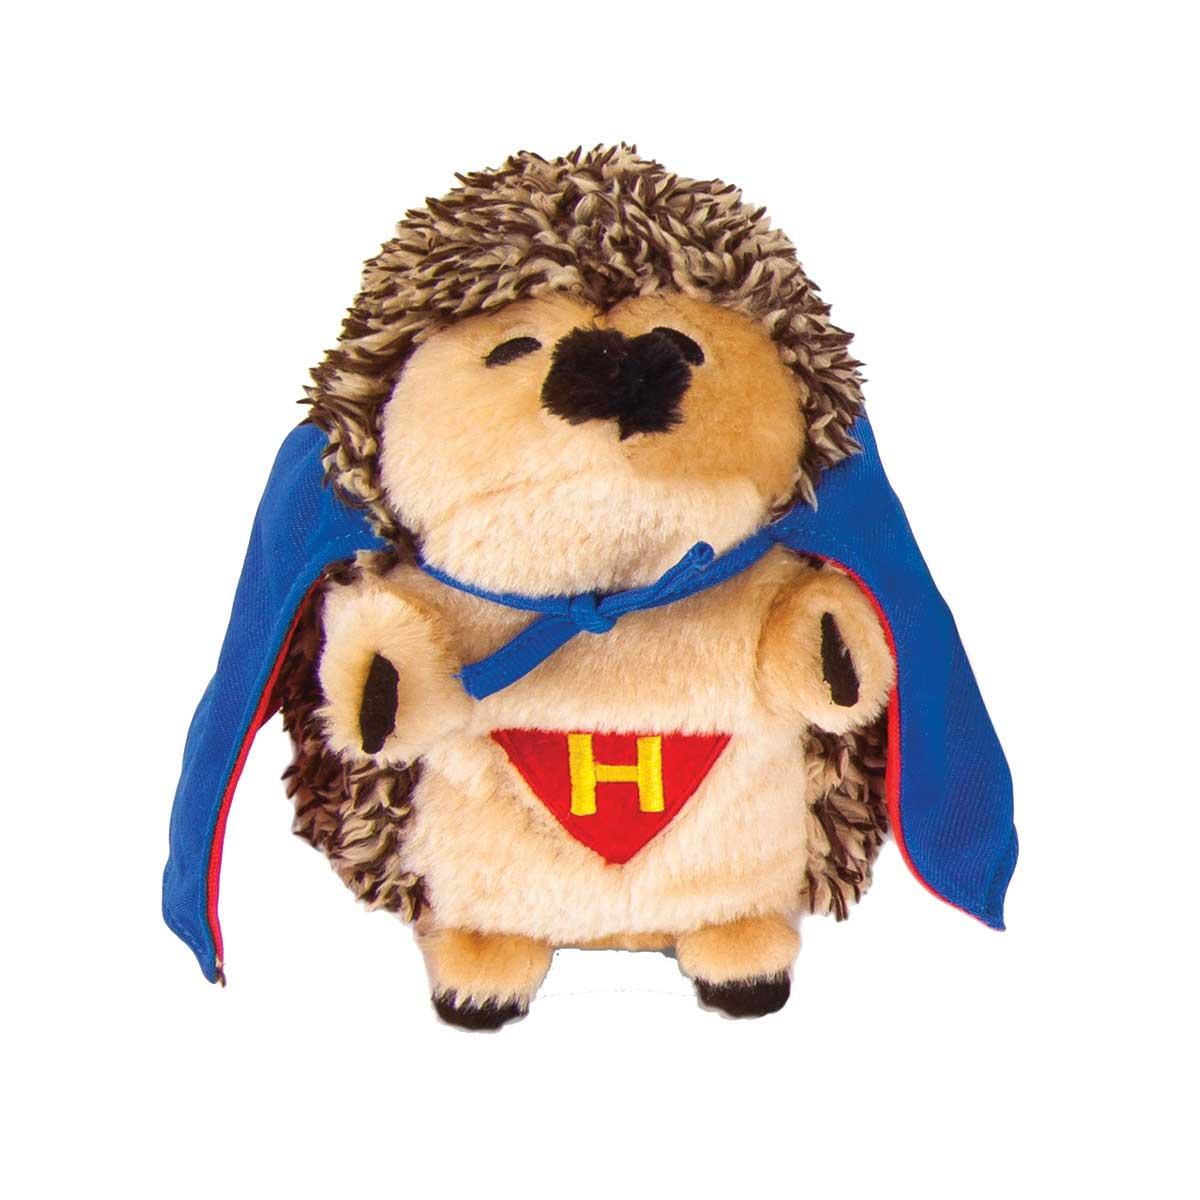 Petmate Stuffed Heggie Super Hero Dog Toy